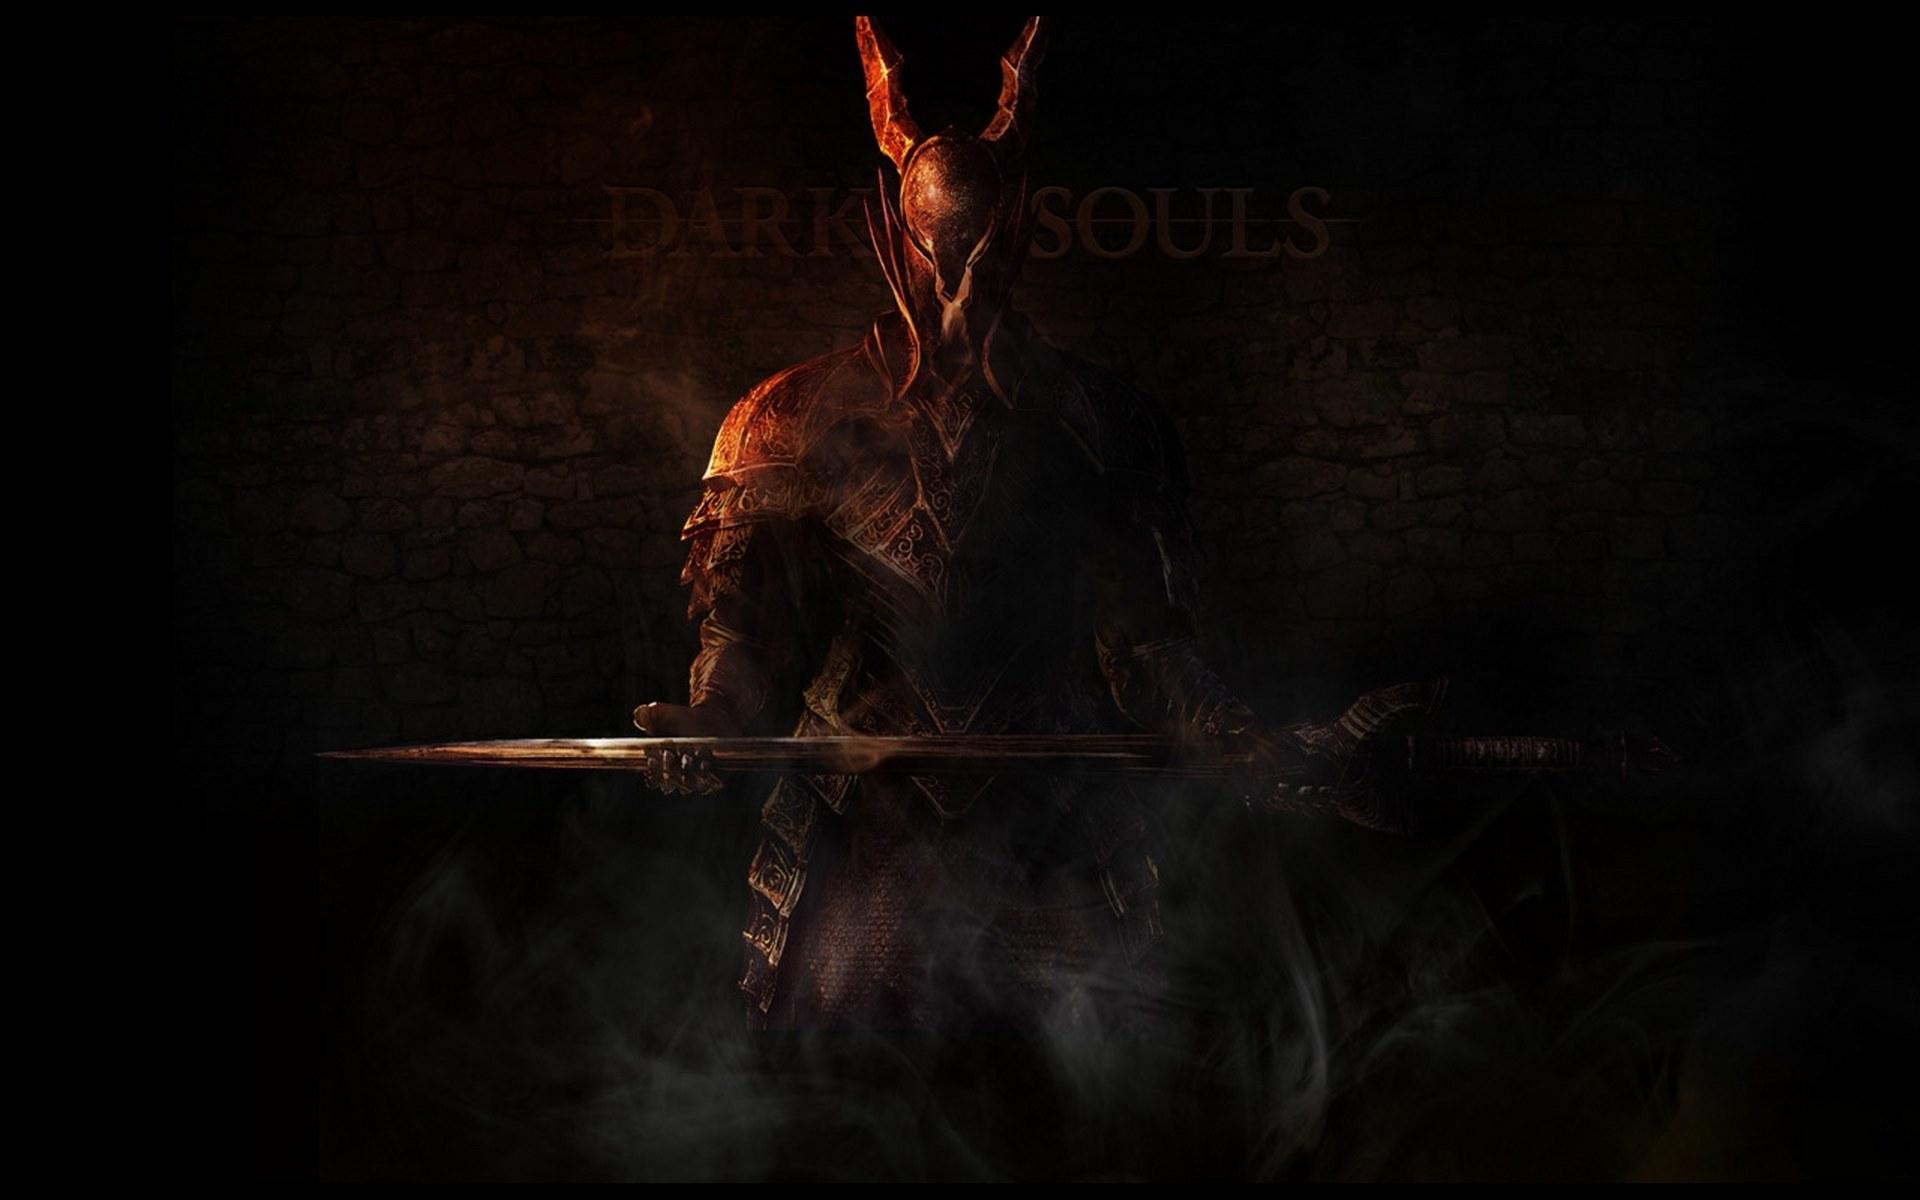 Dark Souls HD Wallpaper wallpapers55com   Best Wallpapers for PCs 1920x1200